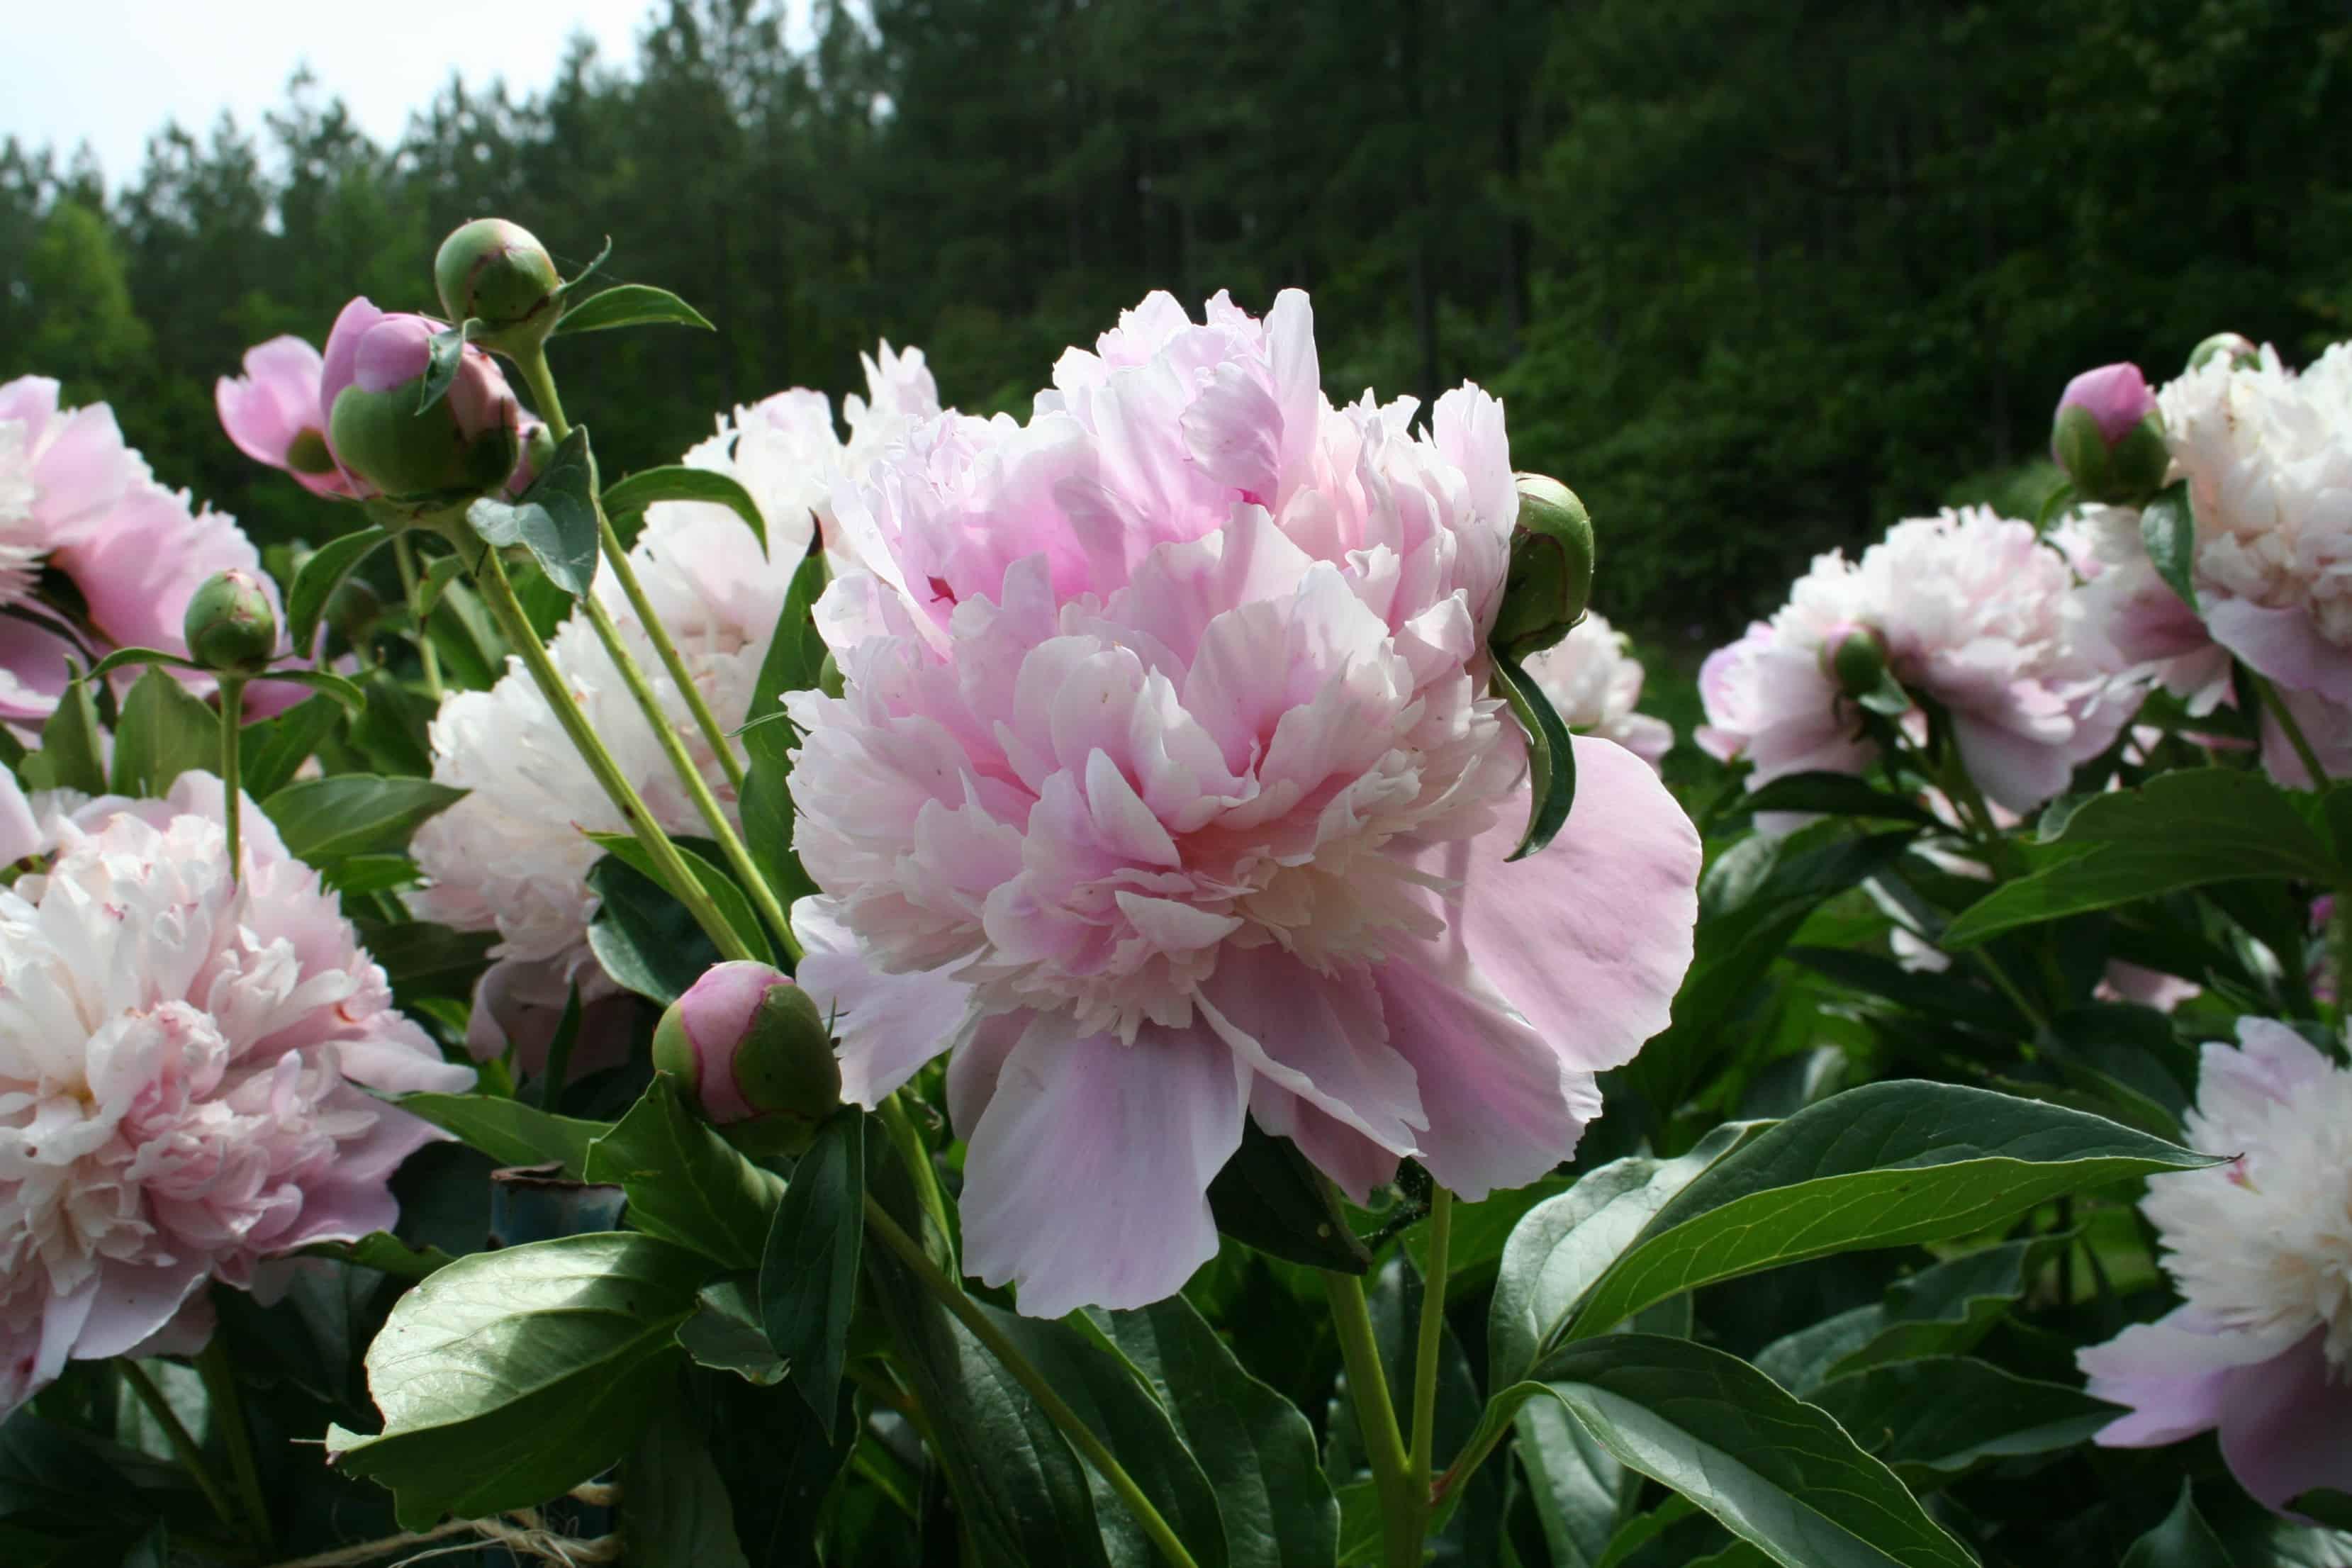 The Garden Update: What's Blooming at Home Garden Joy